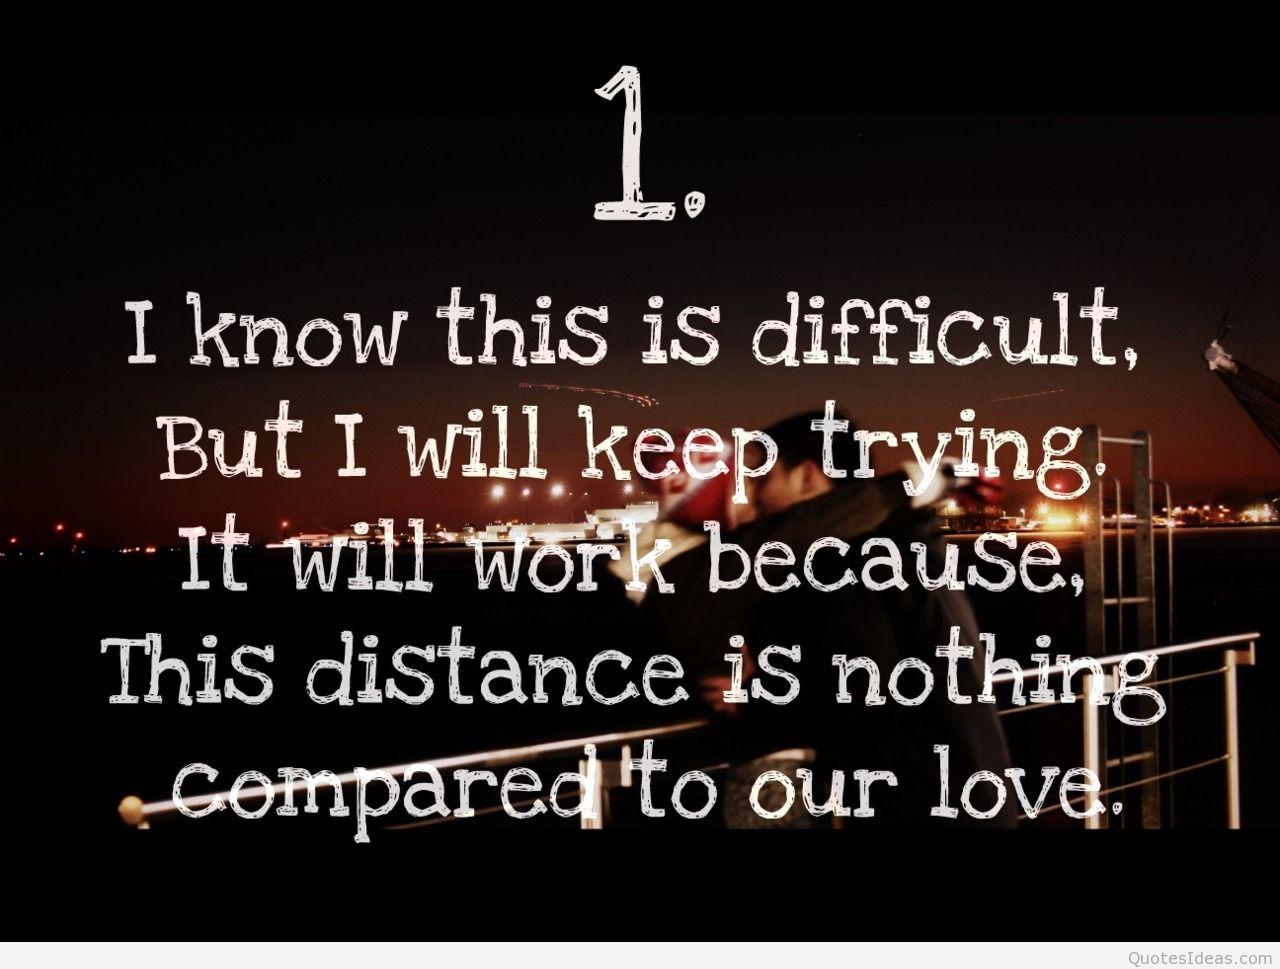 L Fecdecbddf Love Quotes For Him Long Distance Relationship  Tumblr_mrjvqfdvspihwwo_ Tumblr_mbdiyhdyjrsopo_